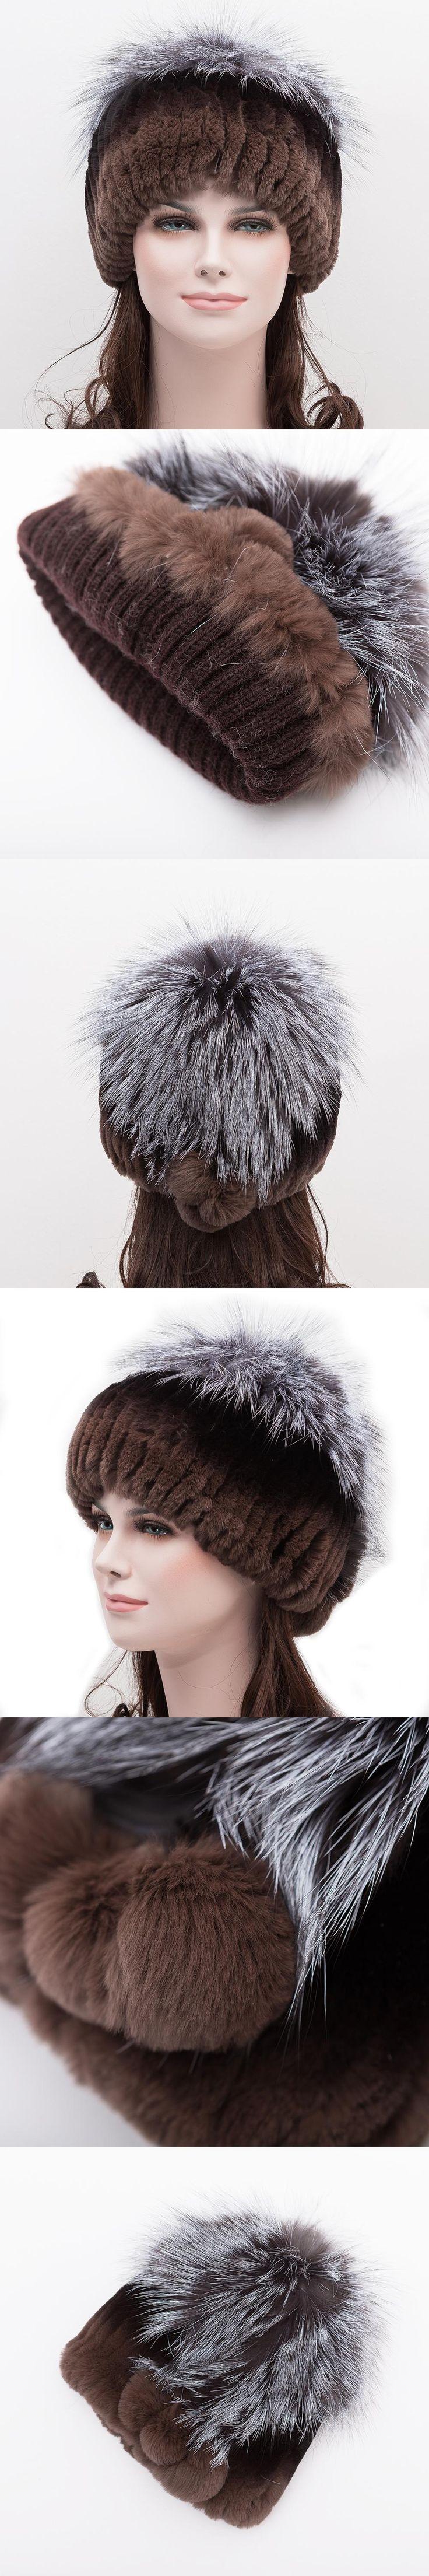 Women's hat real rabbit fur hat for women winter silver fox fur rabbit fur Russia russian fur hat hot  female brand warm cap